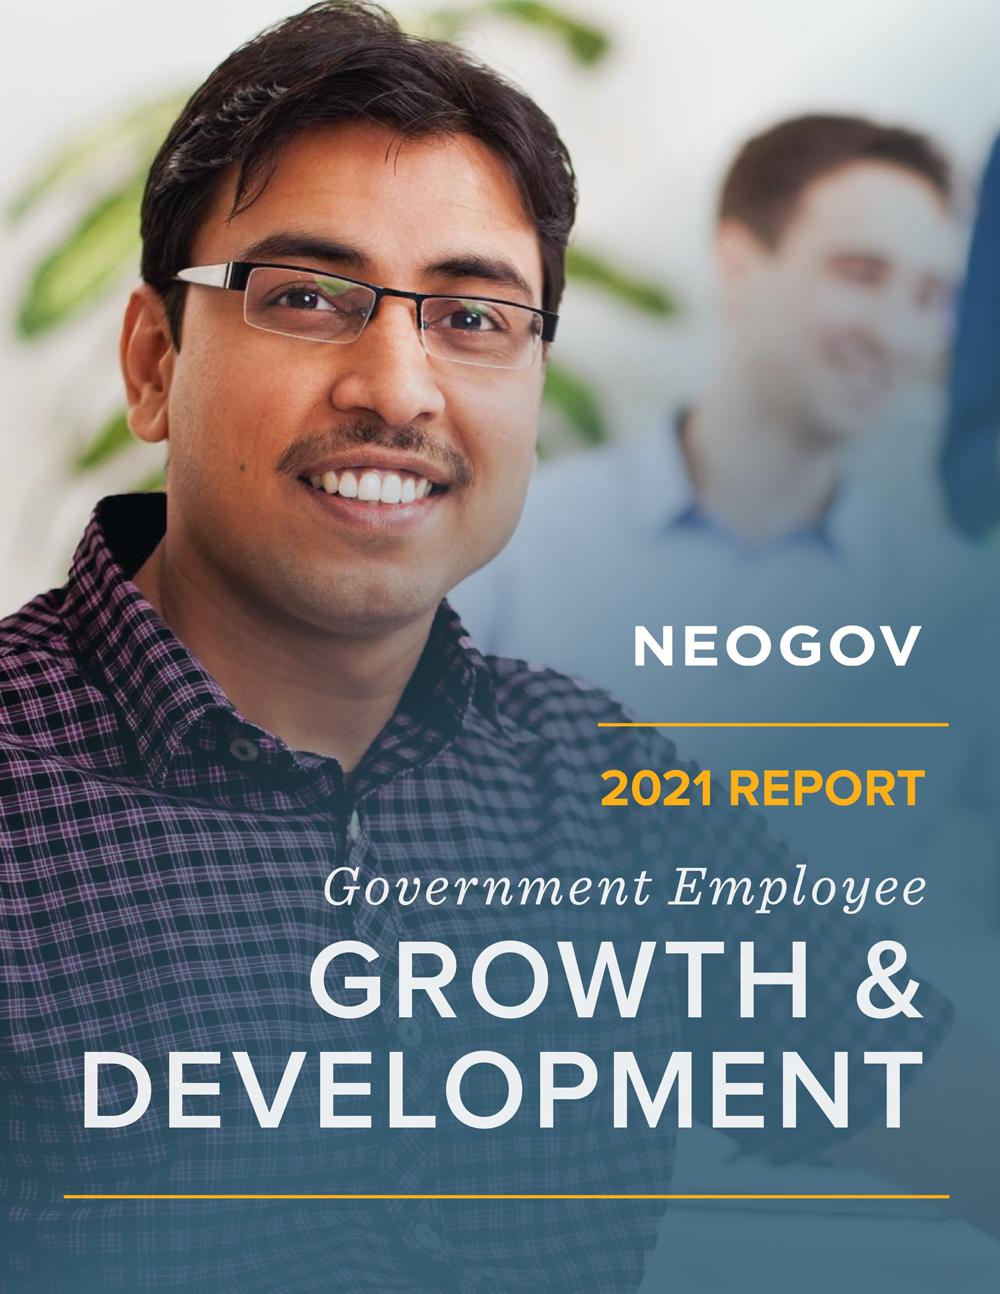 2021 Report: Government Employee Growth & Development